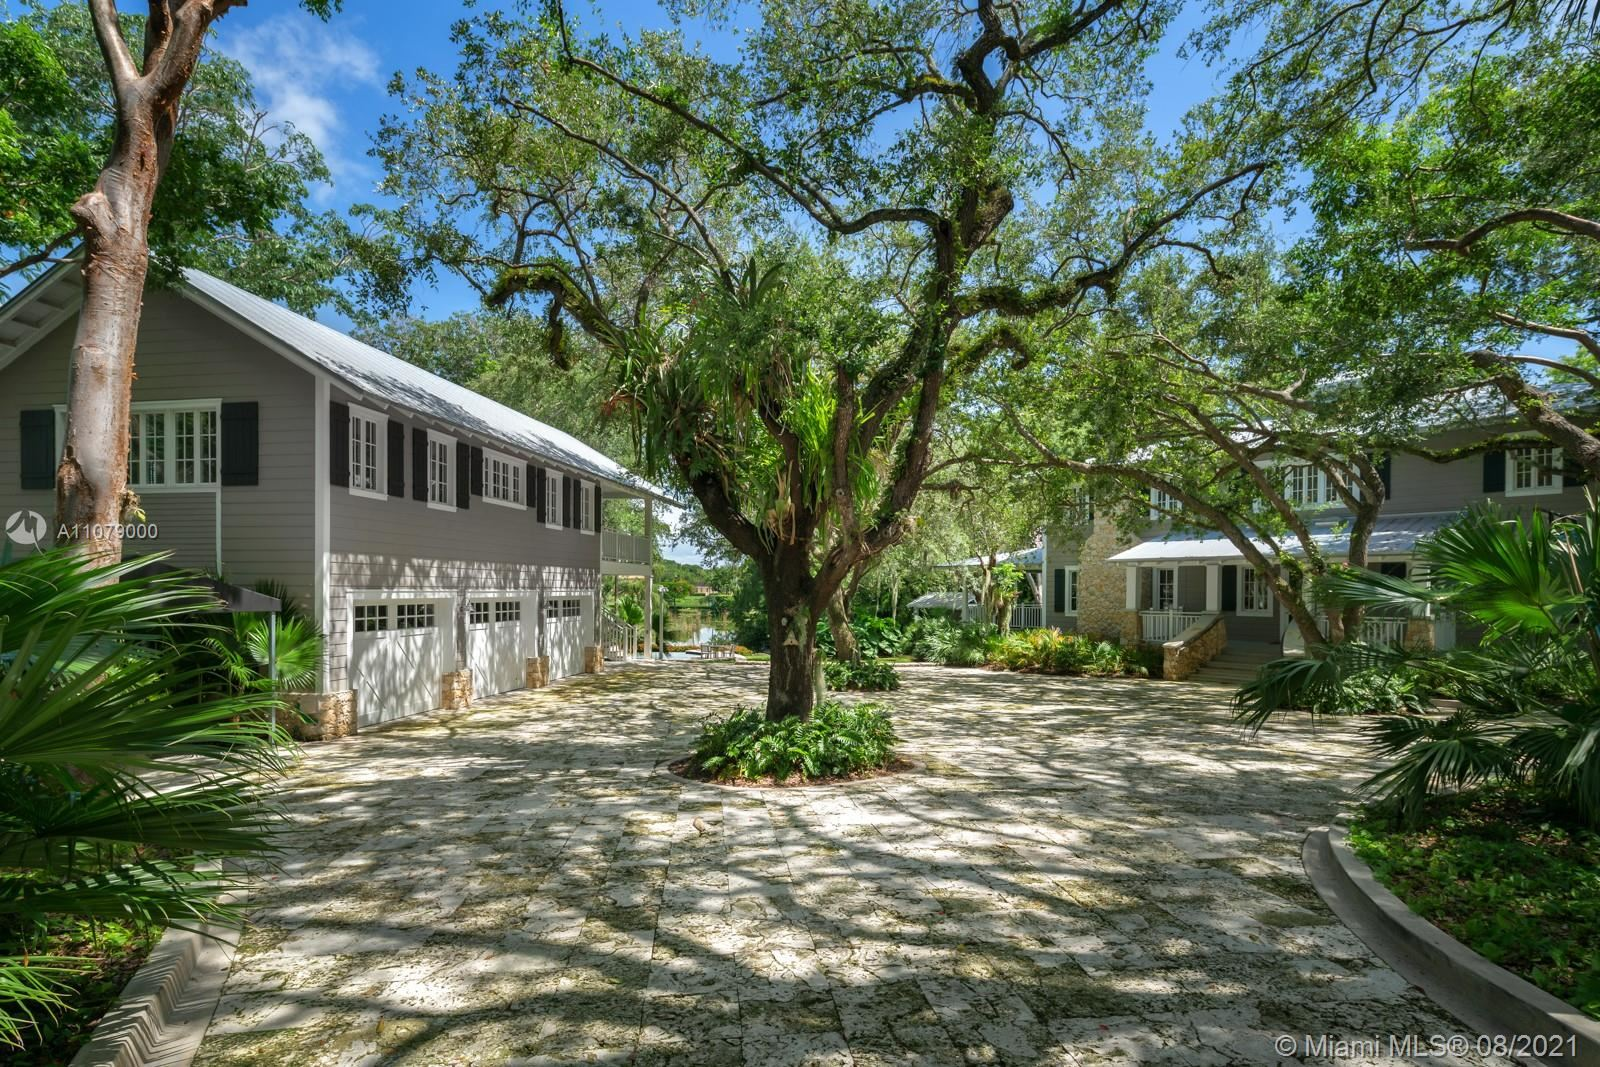 4845 Hammock Lake Dr, Coral Gables, FL 33156 - #: A11079000